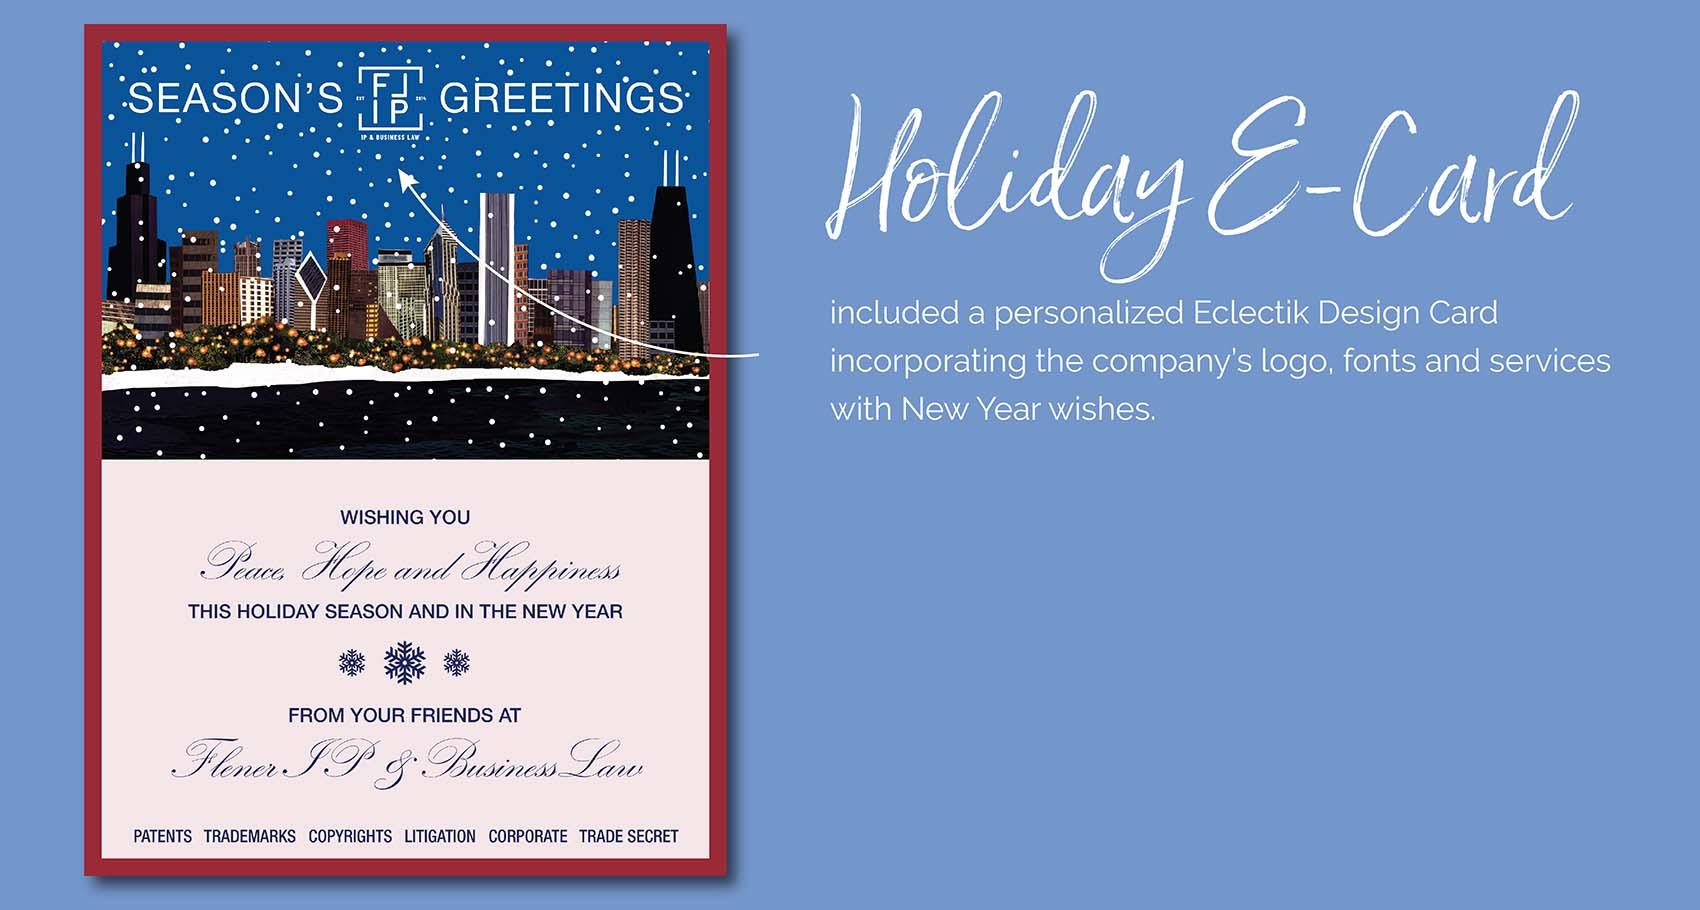 Holiday E-Card Design With Company Logo